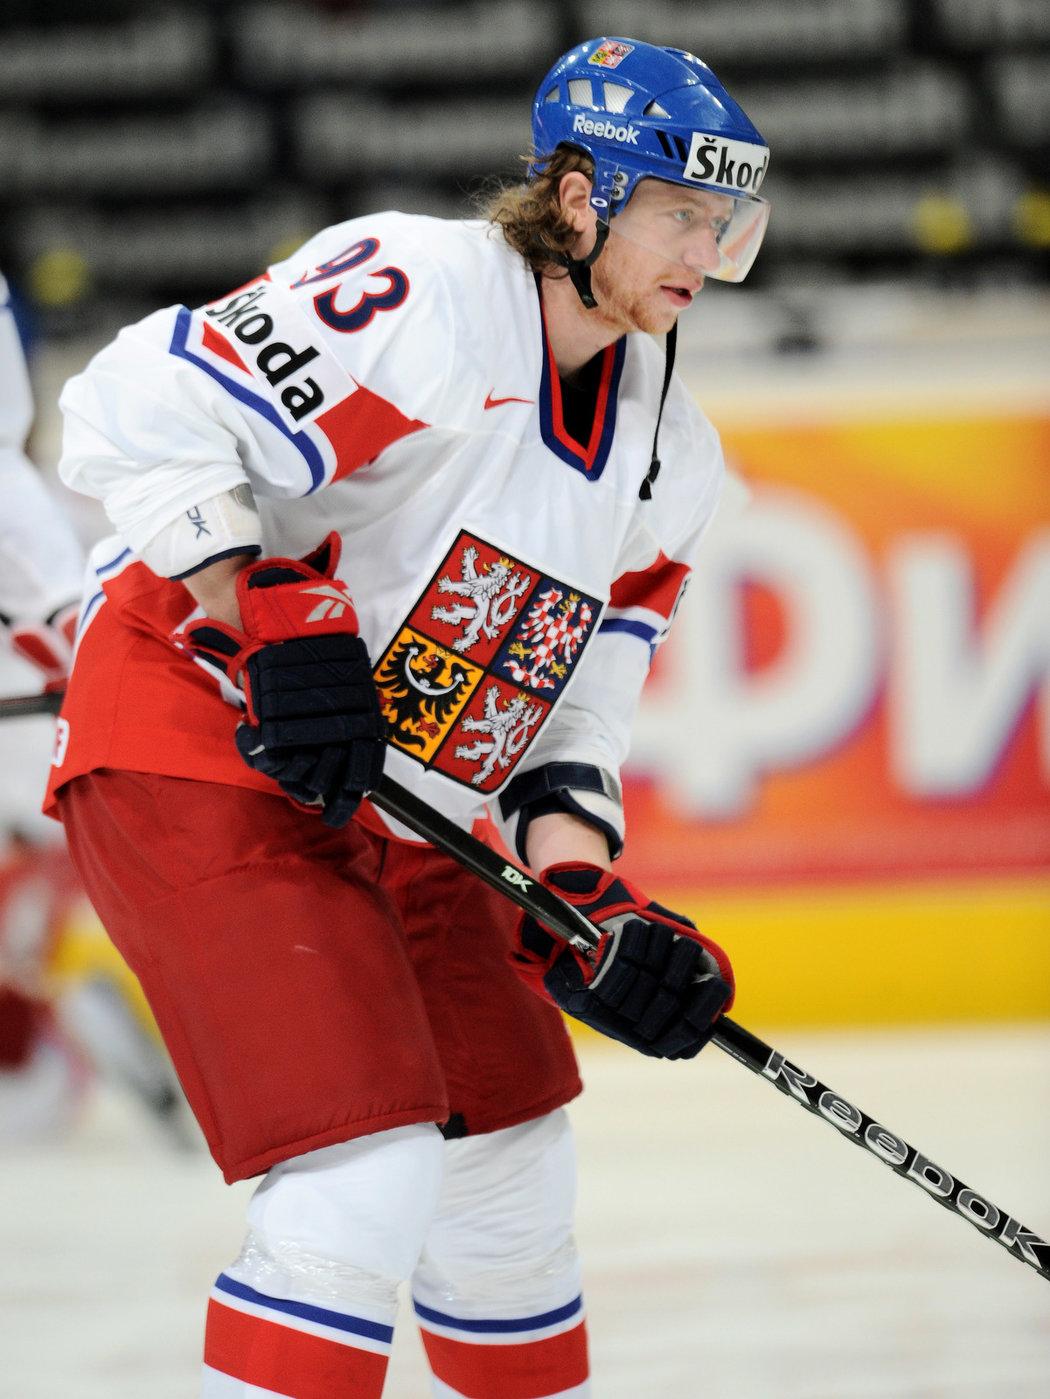 Jakubovi Voráčkovi bylo na zlatém MS 2010 teprve dvacet